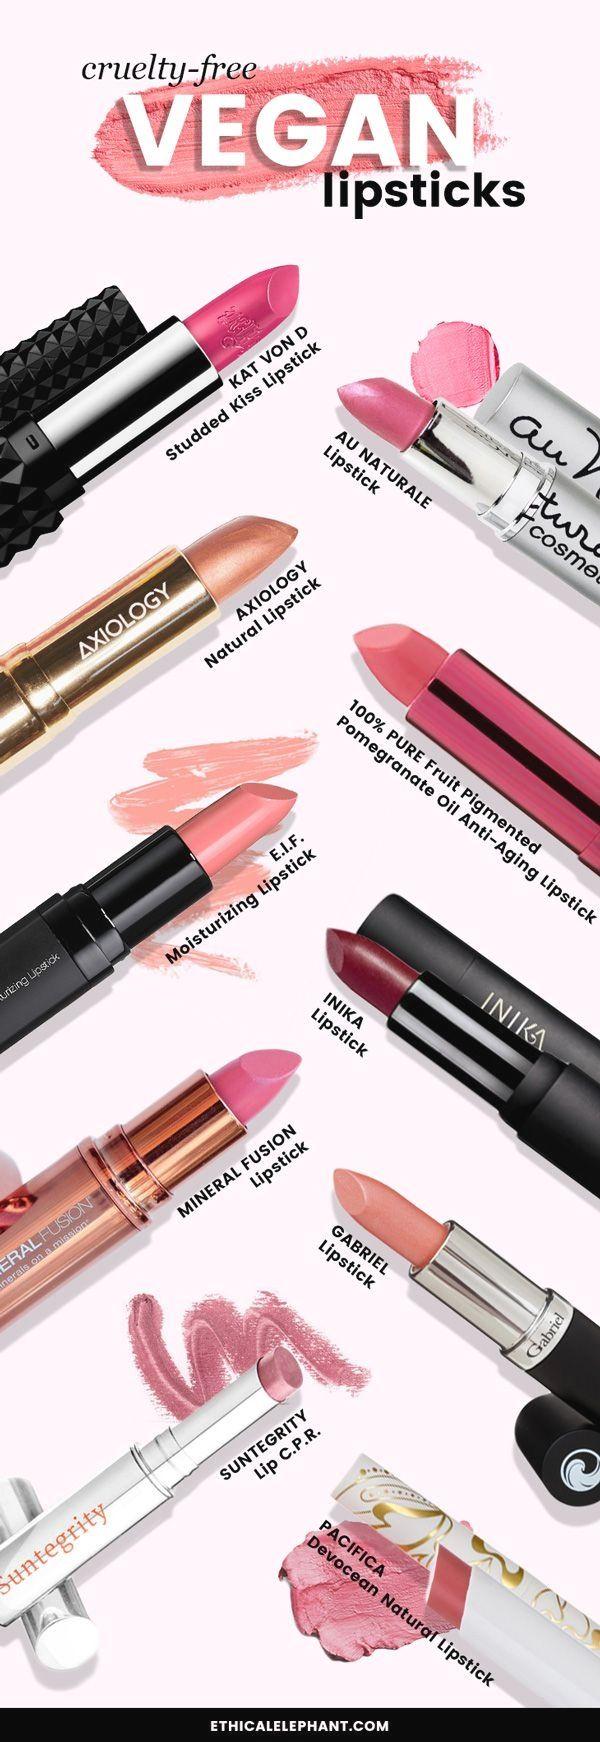 List of crueltyfr .. Vegan lipsticks, Cruelty free